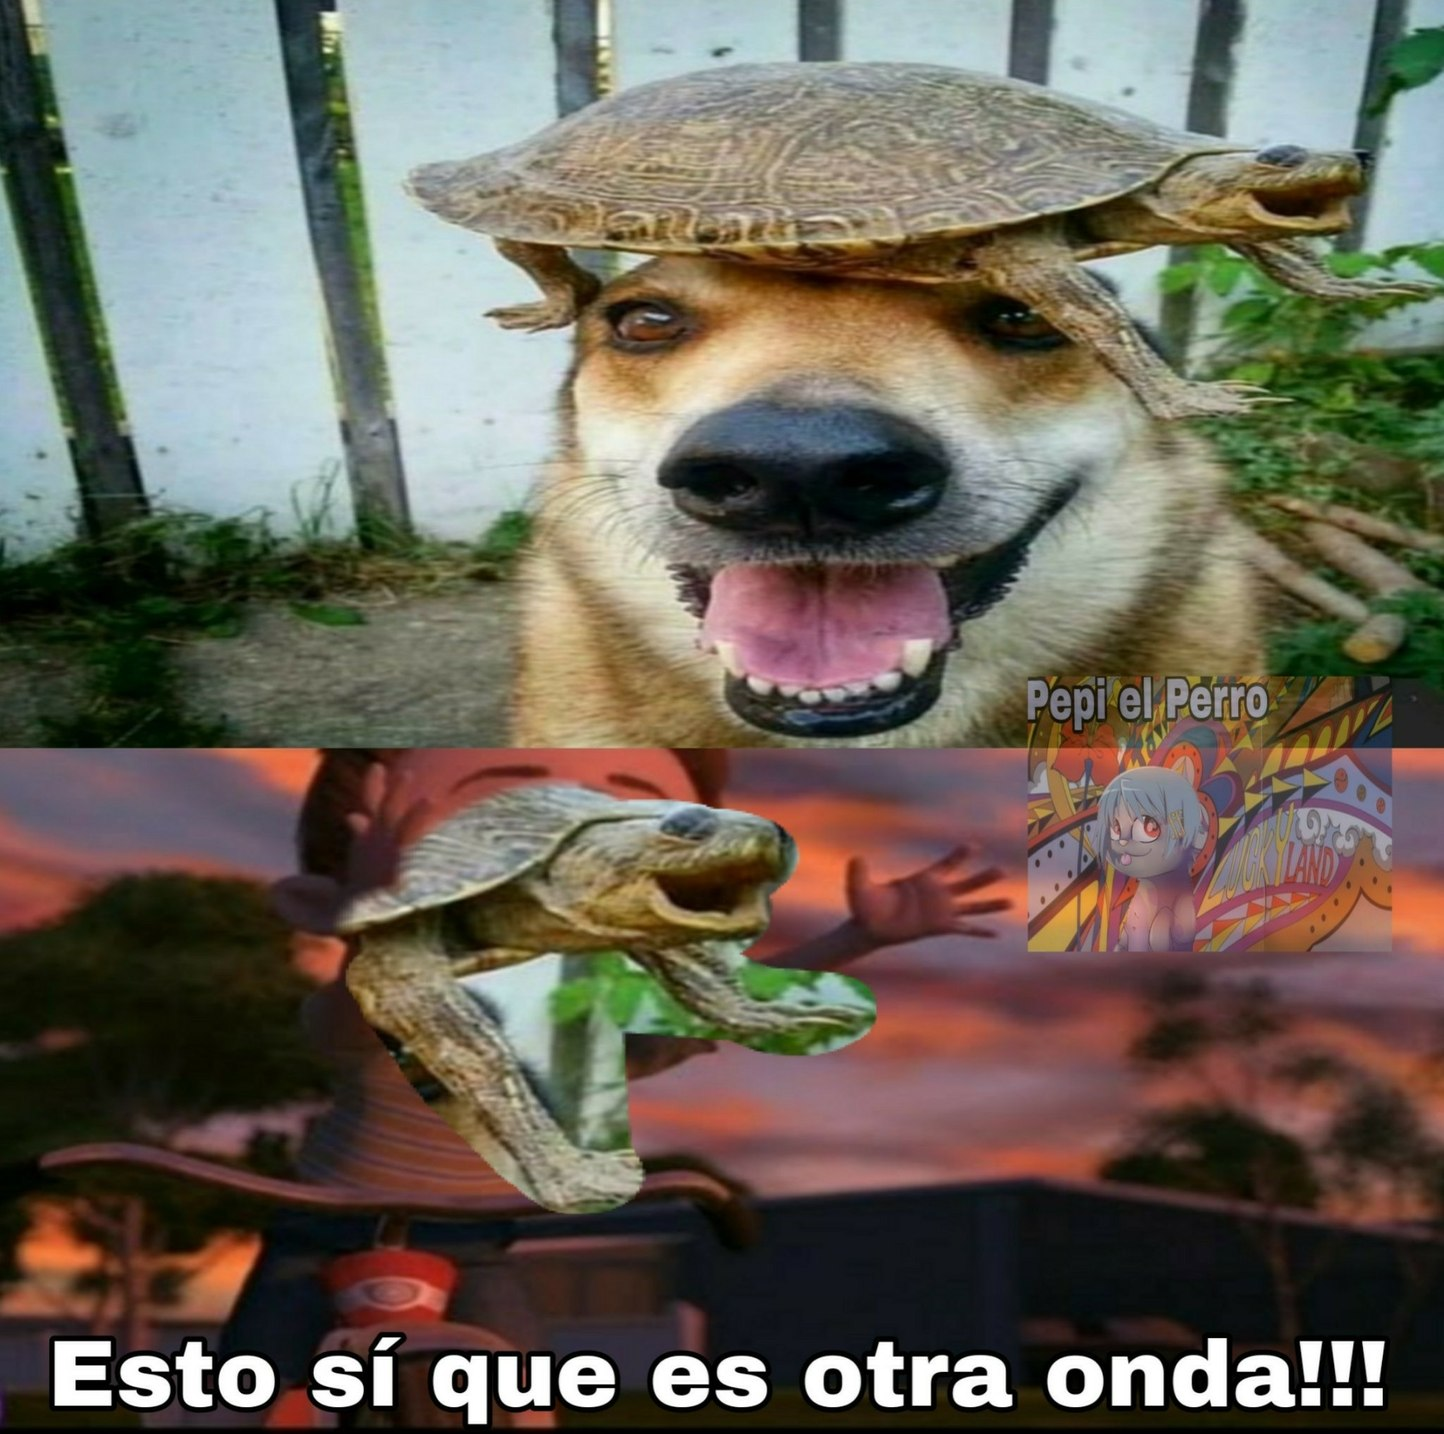 Una tortuga vivió feliz. - meme